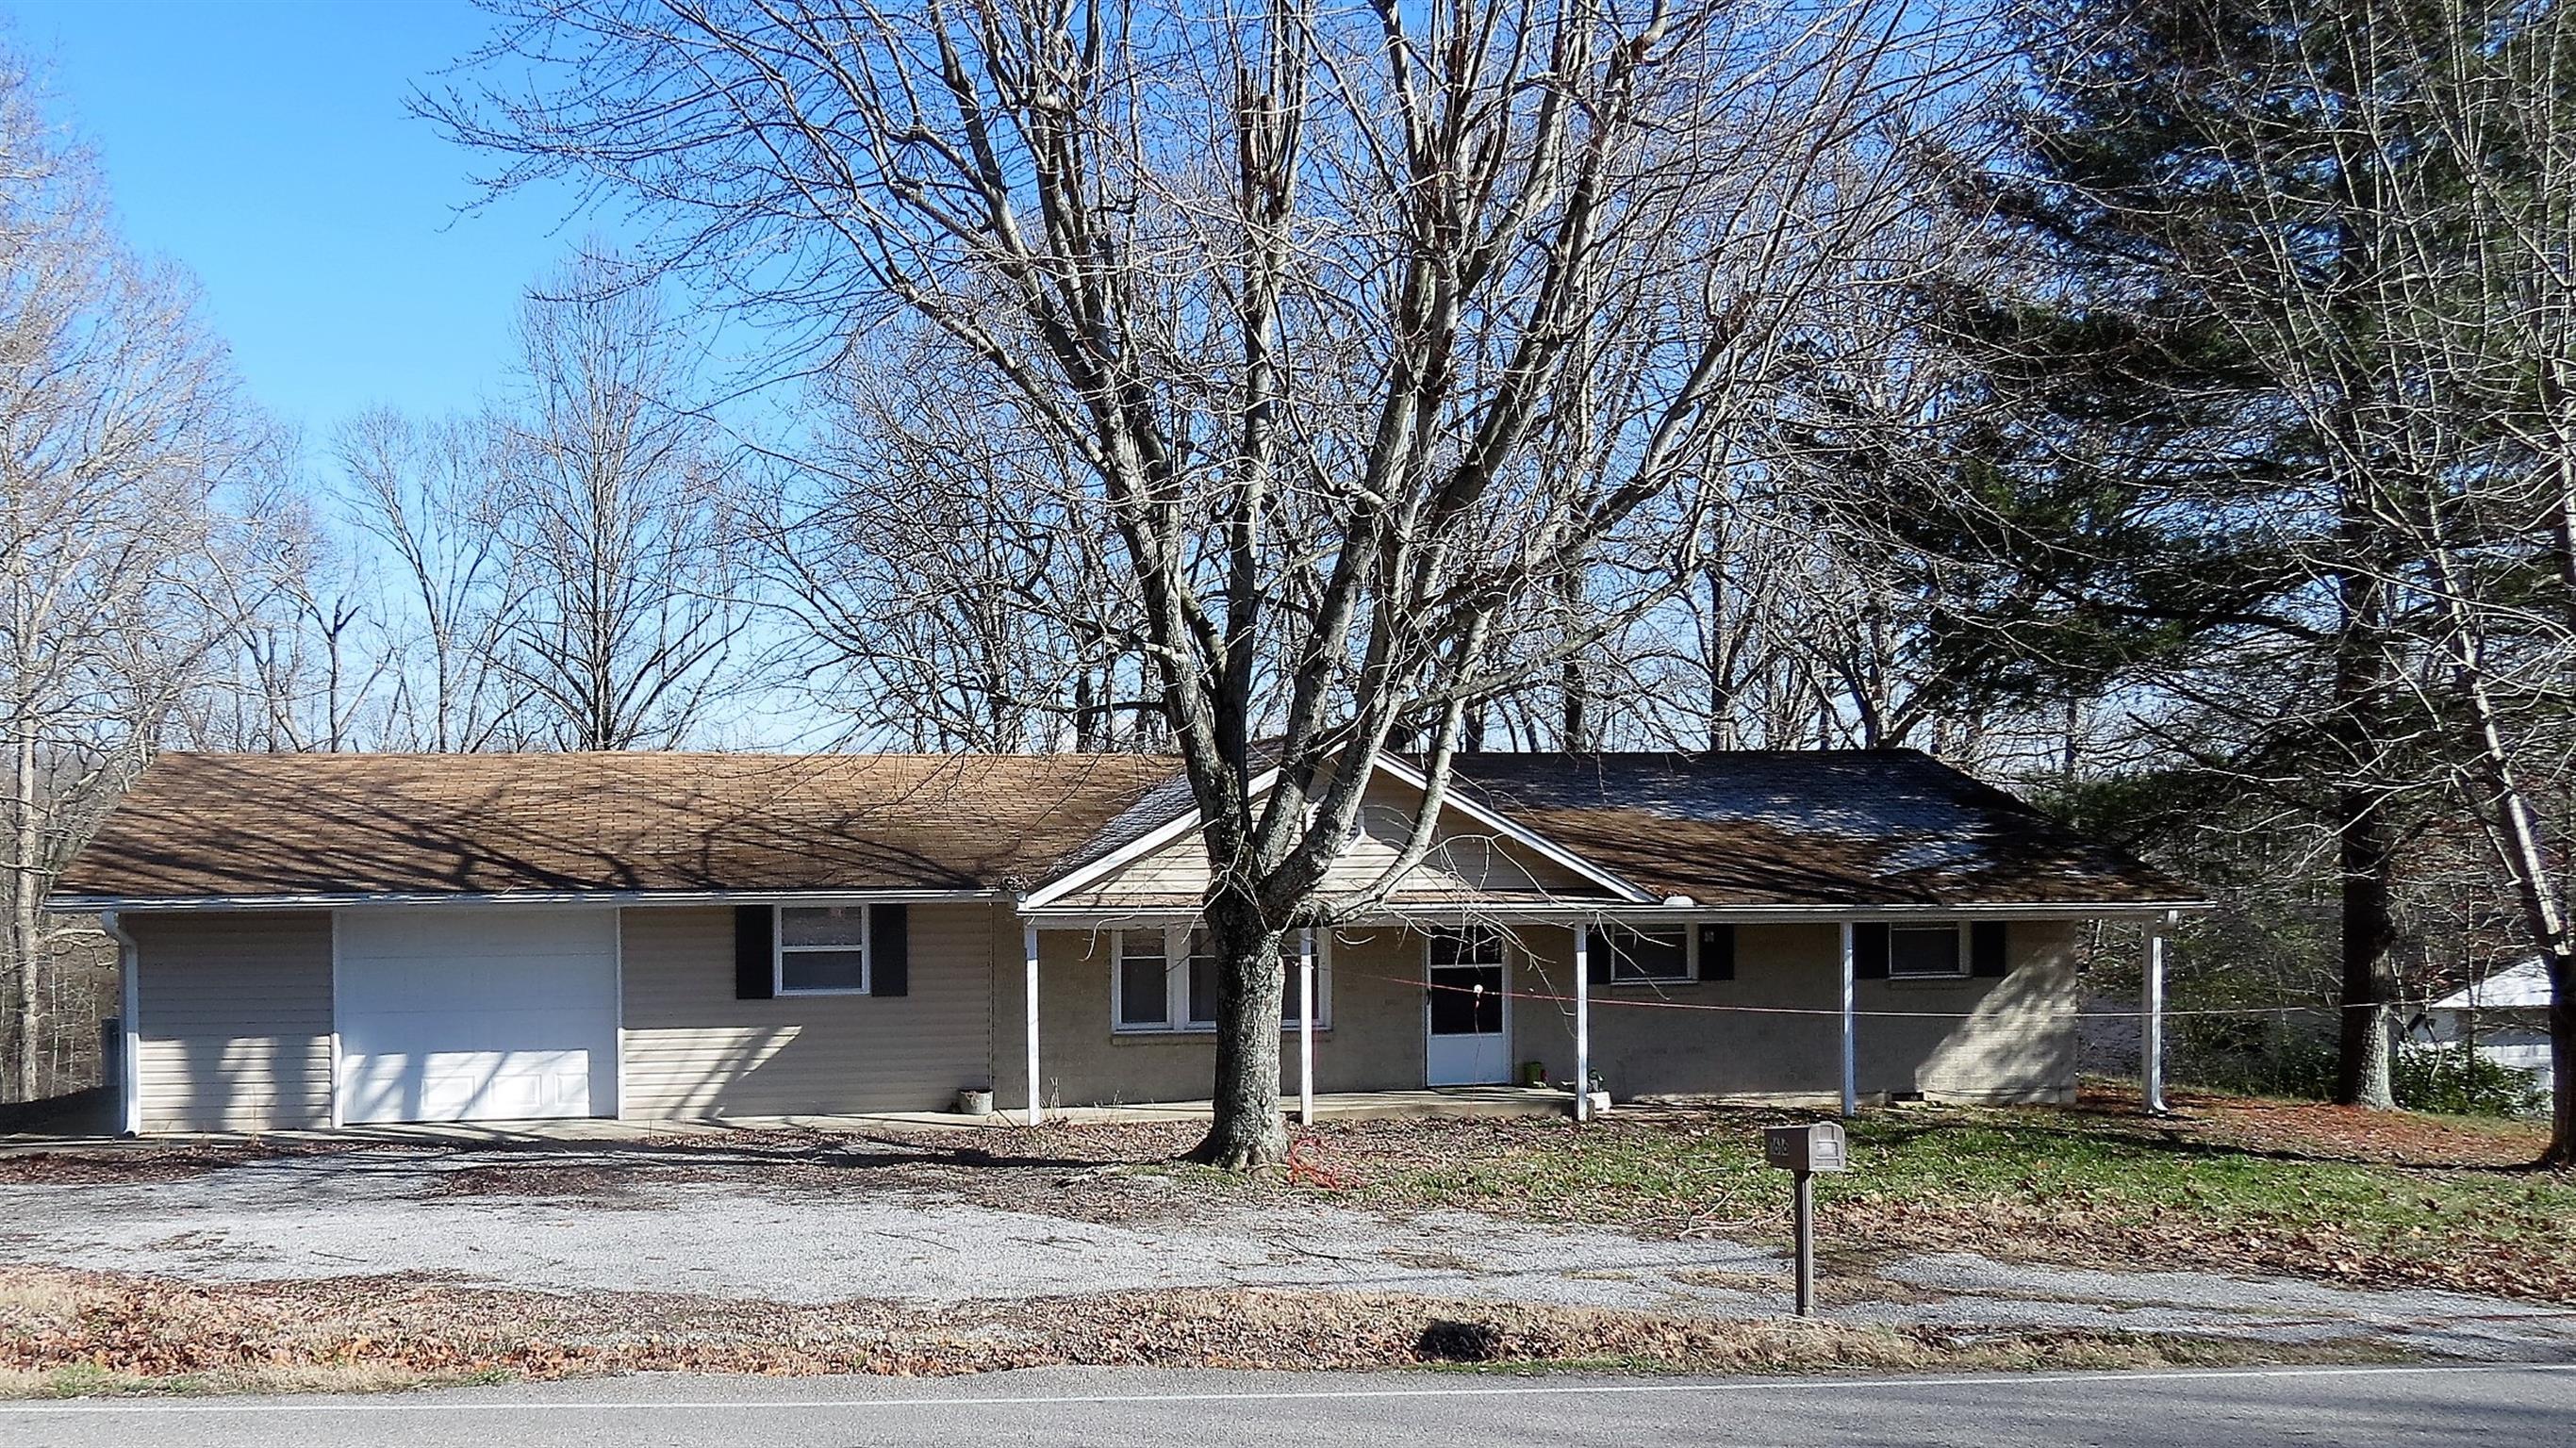 1616 Mobley Ln, Erin, TN 37061 - Erin, TN real estate listing